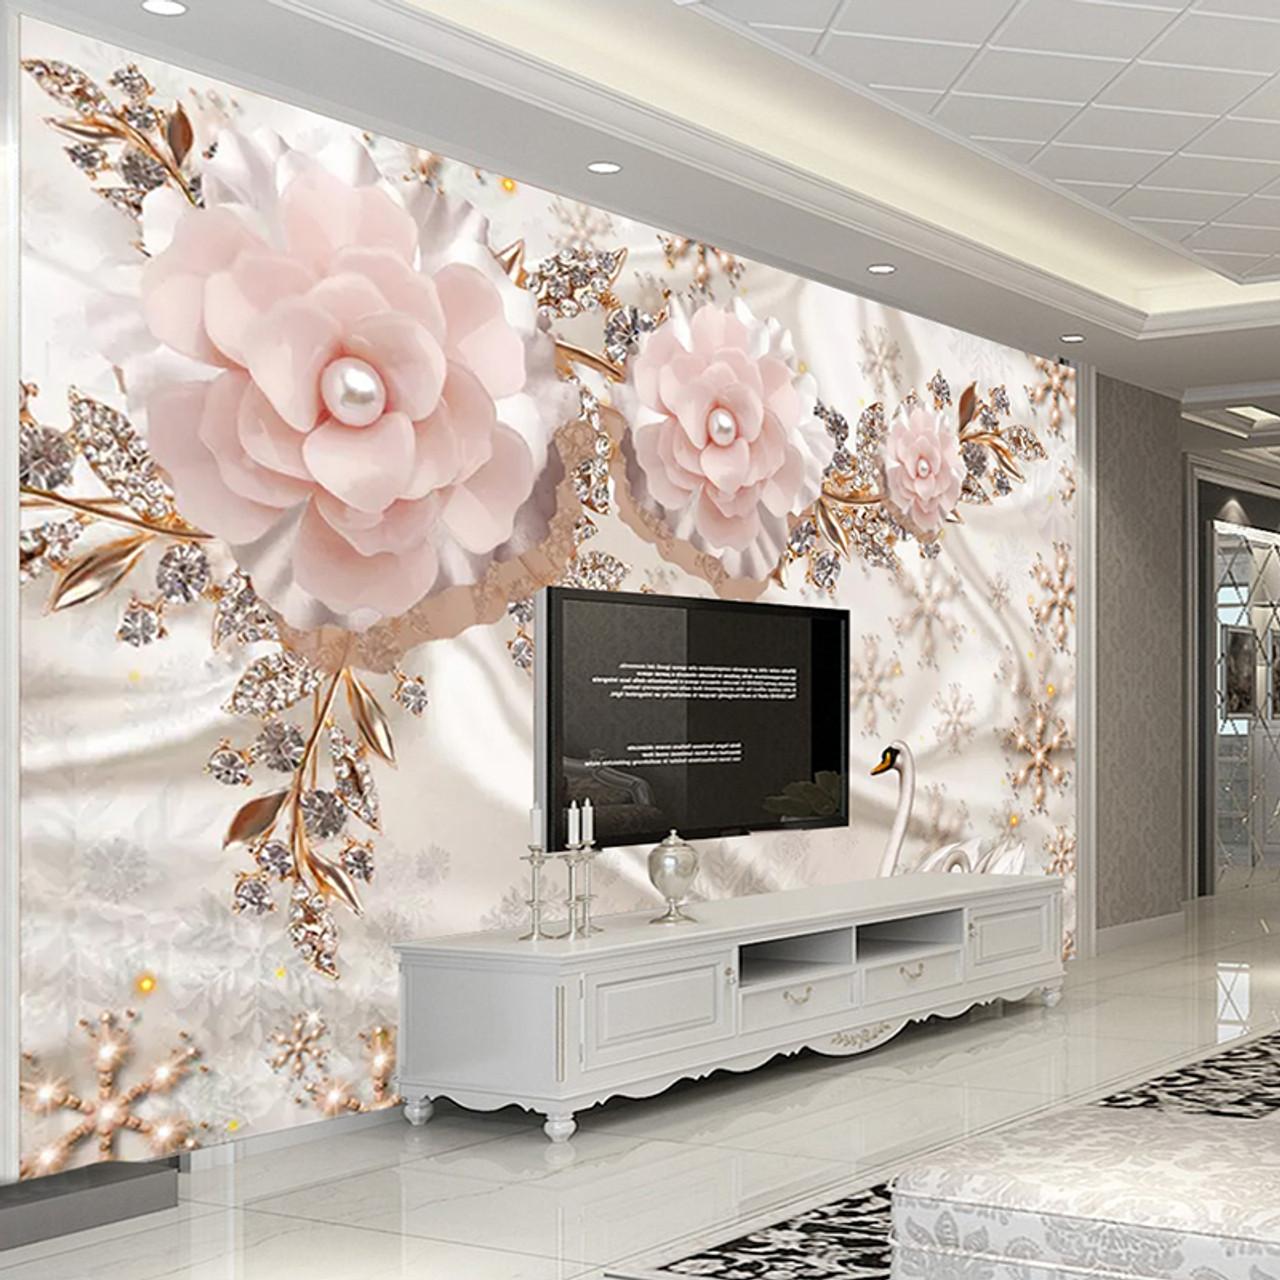 Custom Photo Wallpaper 3D Luxury European Style Swan Jewelry Flowers Living  Room TV Background Wall Decor Mural Papel De Parede